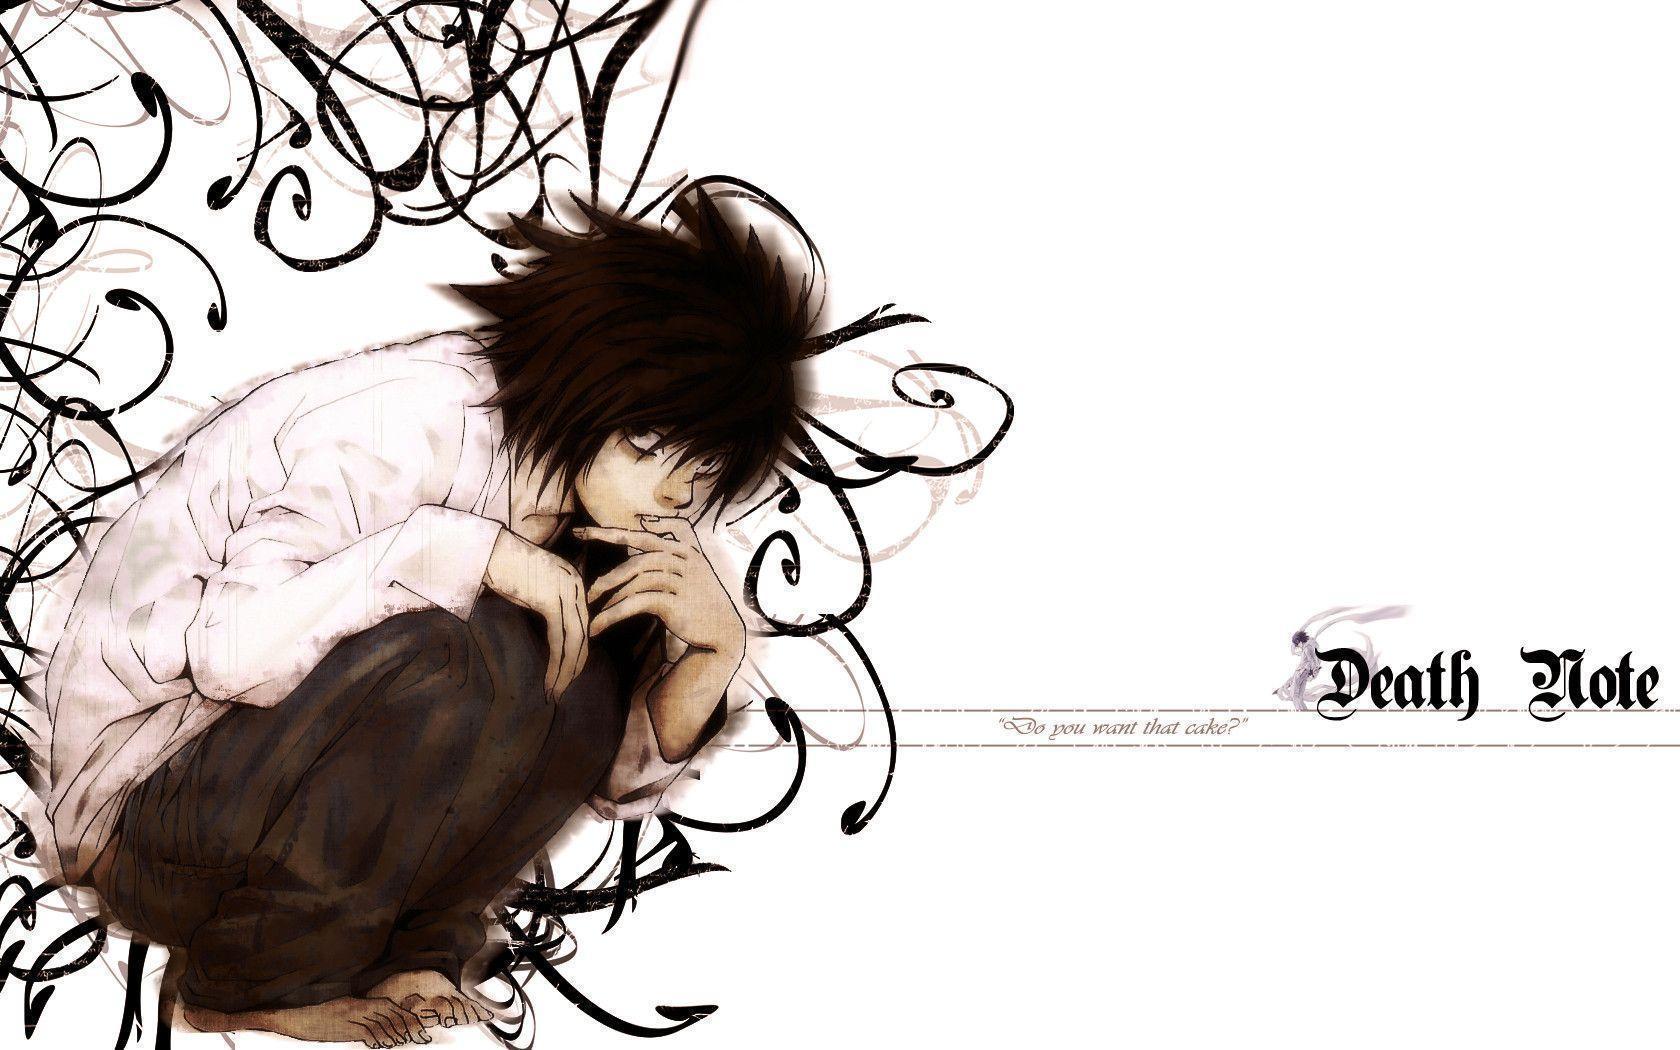 Death Note L Wallpapers - Wallpaper Cave